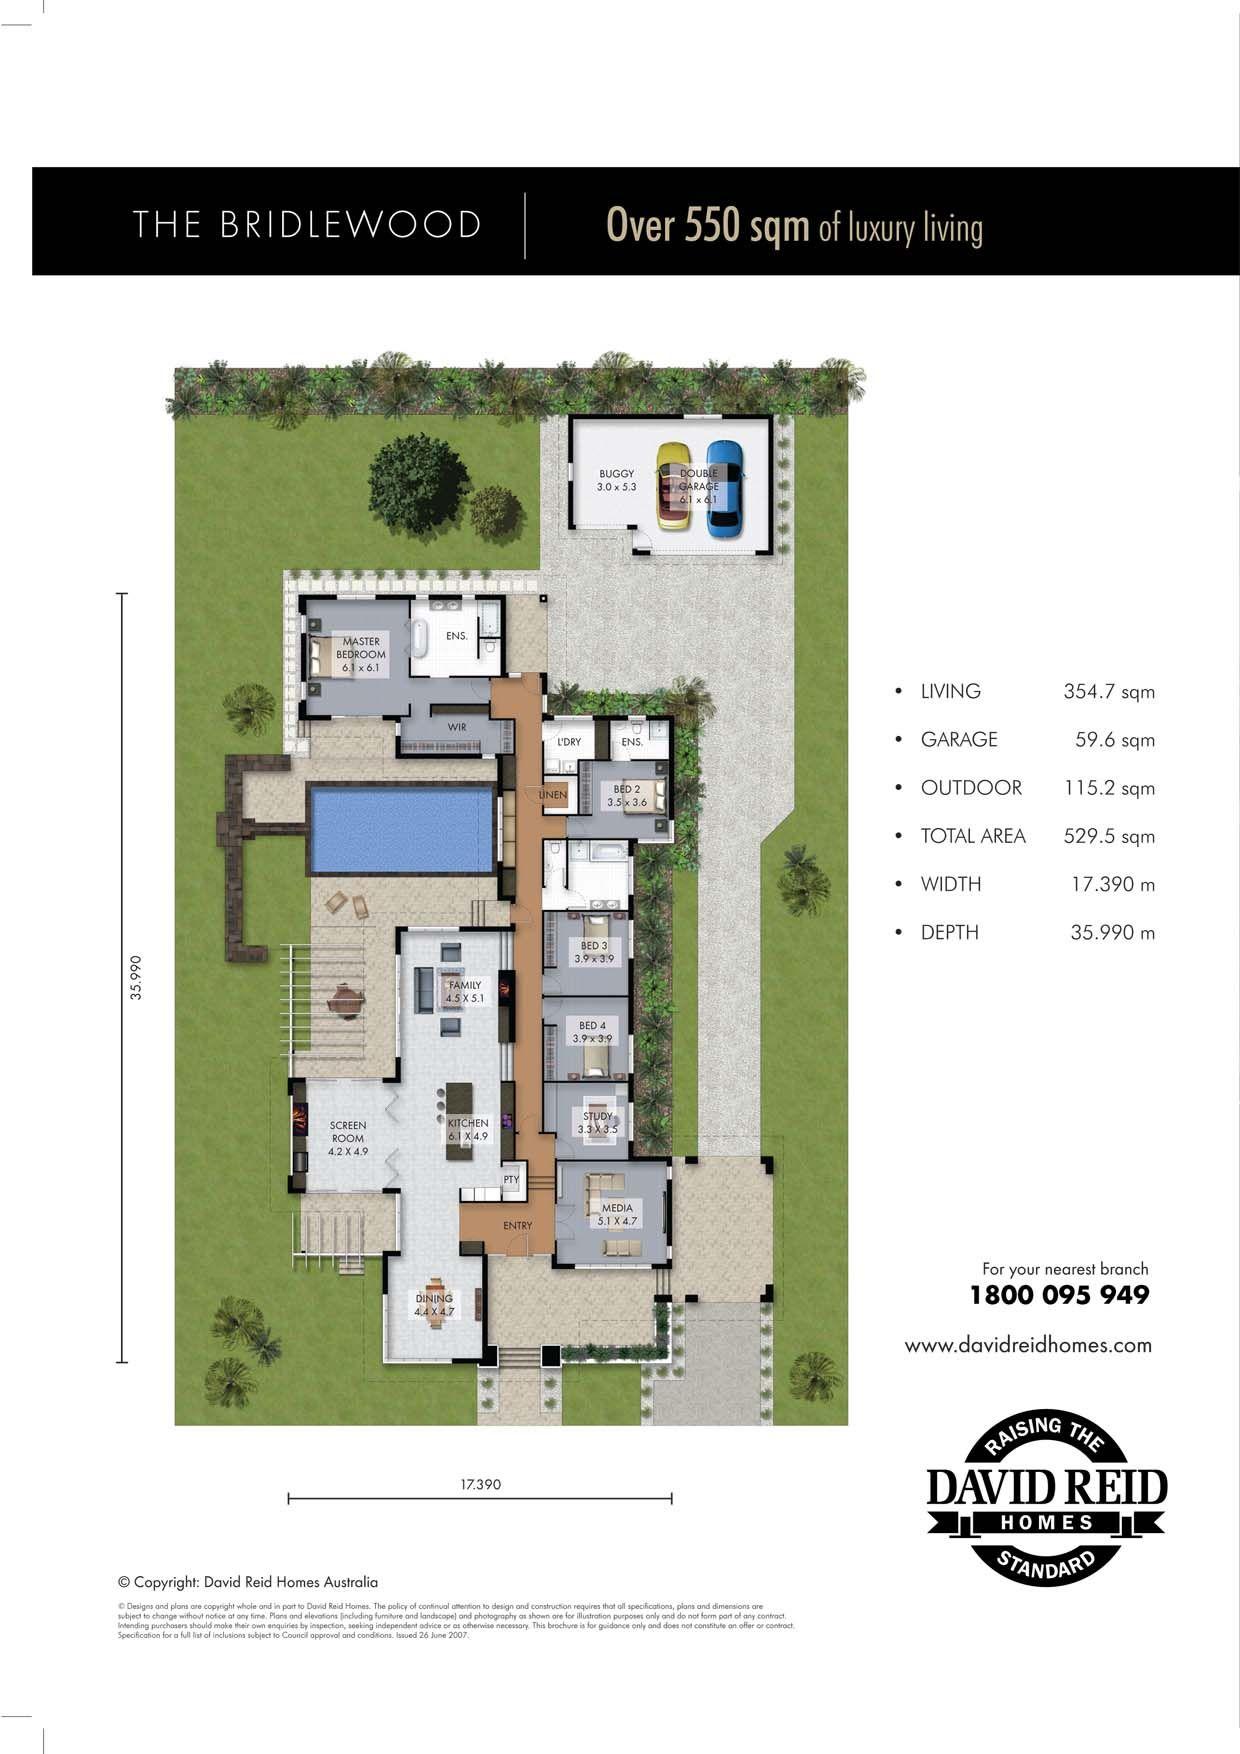 The Bridlewood Floor Plan Concept Range David Reid Homes Australia Luxury Custom Home Builder Floor Plans House Floor Plans How To Plan